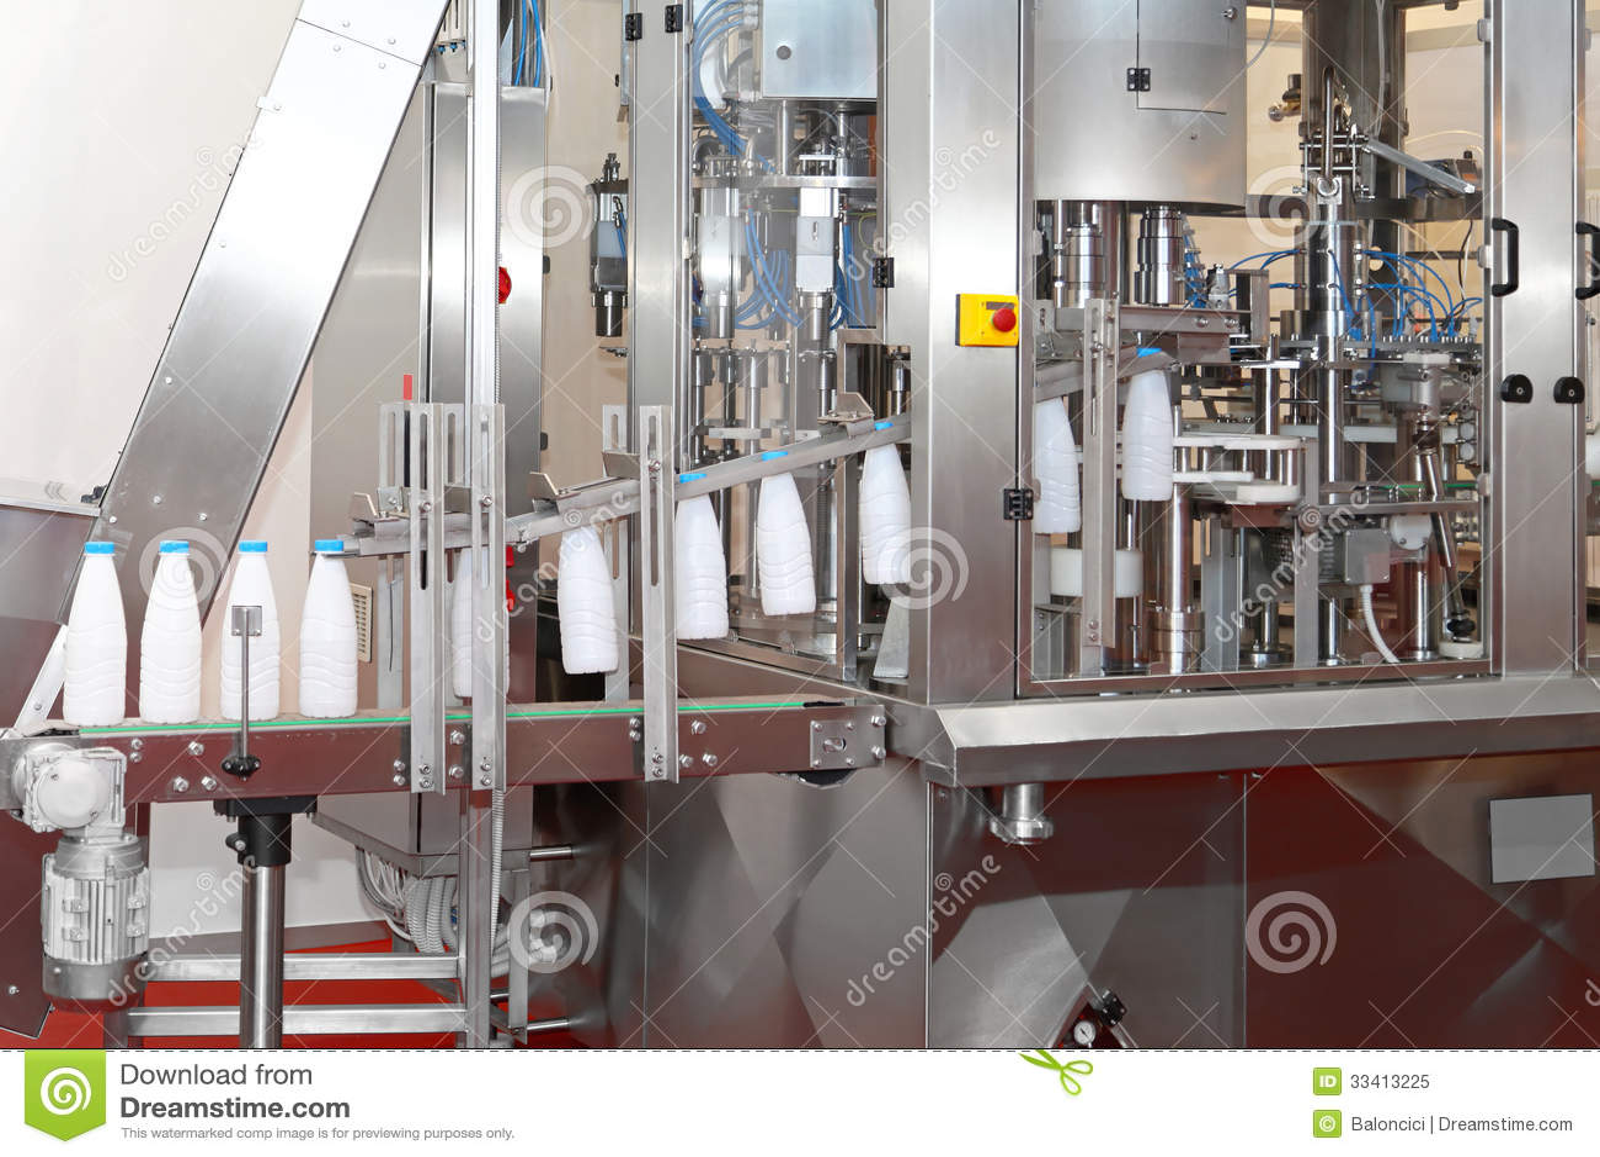 Food production machine